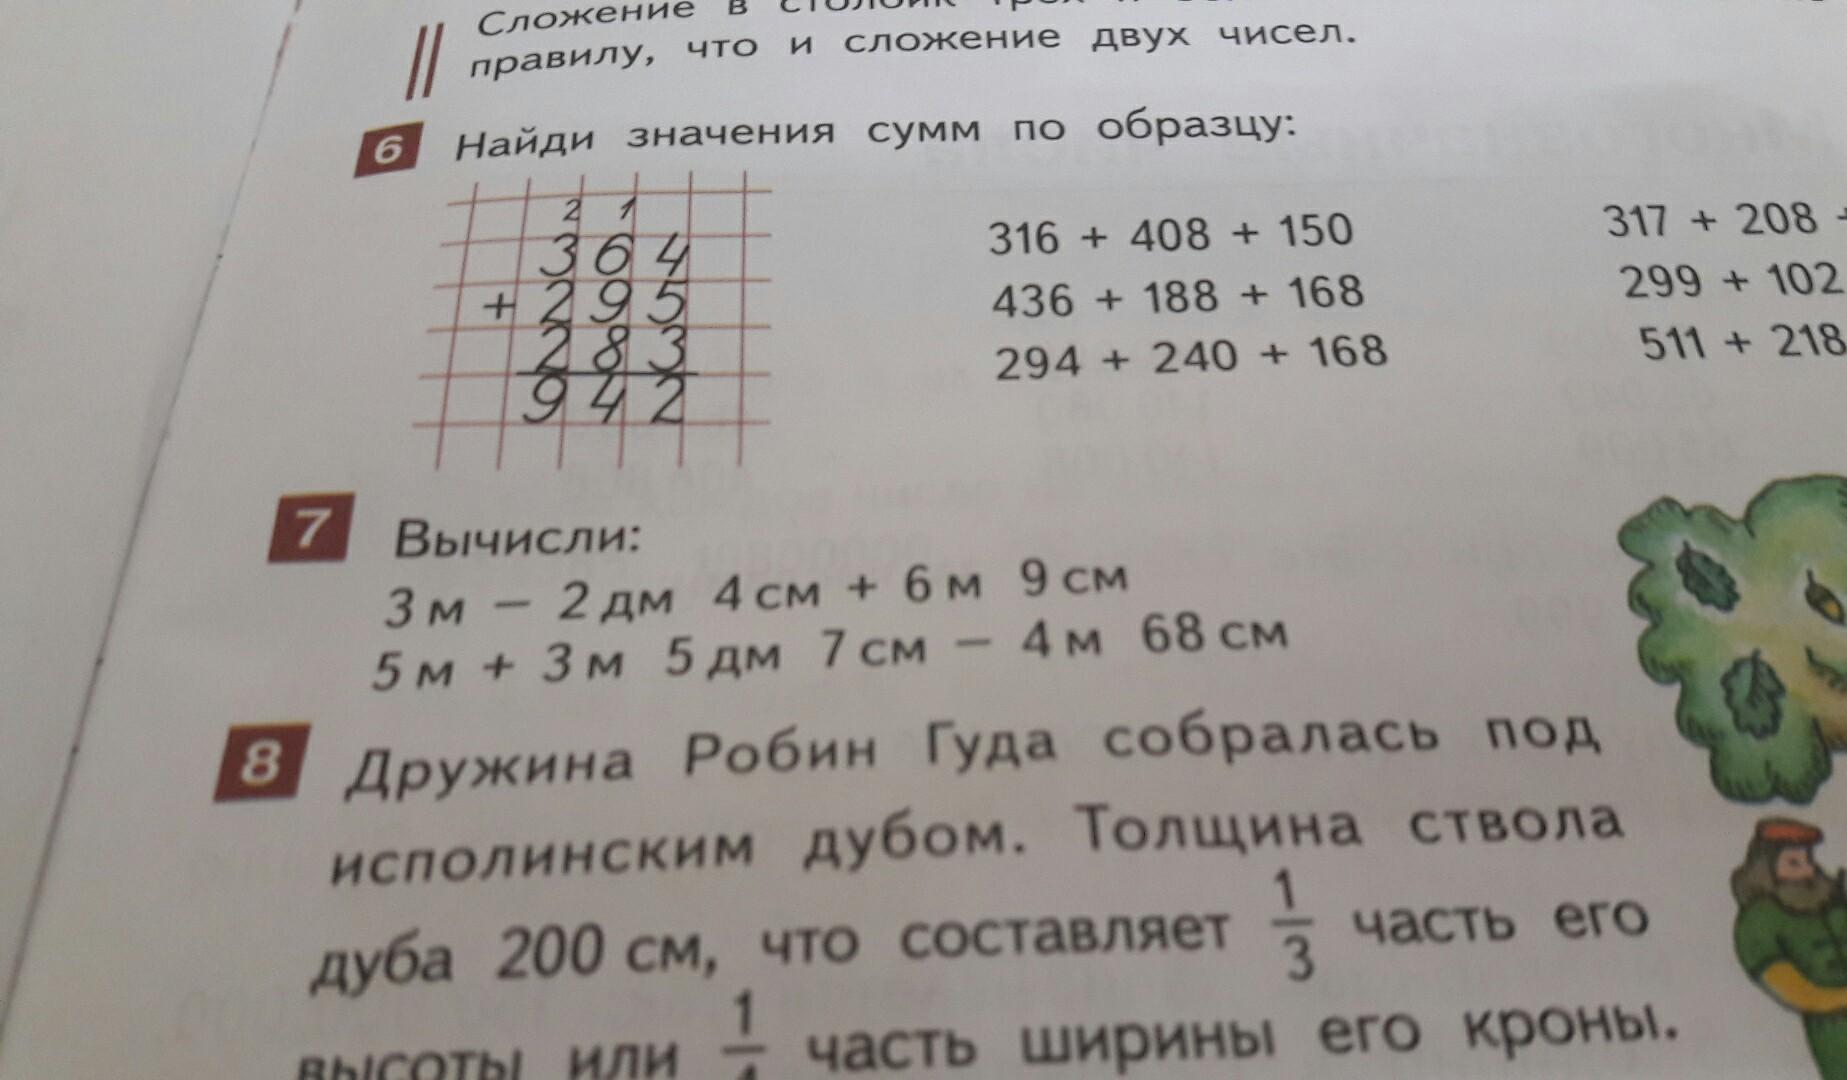 3м -2дм 4см +6м 9см5м+3м 5дм